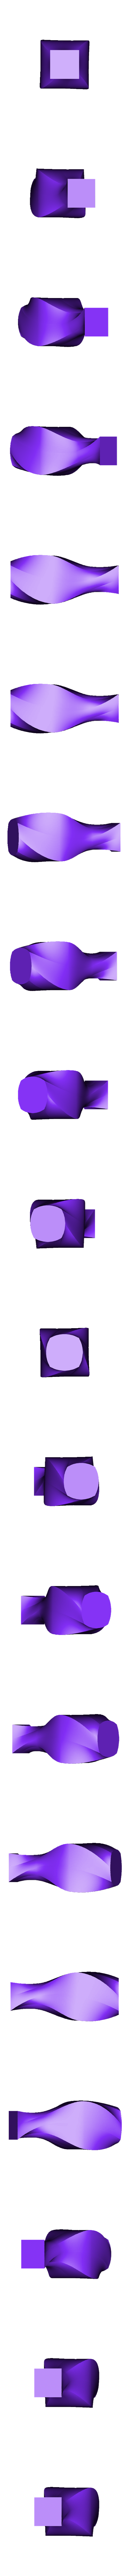 SquareEdgeVase.stl Download free STL file Valentines Heart Vases • 3D printing design, Thomllama